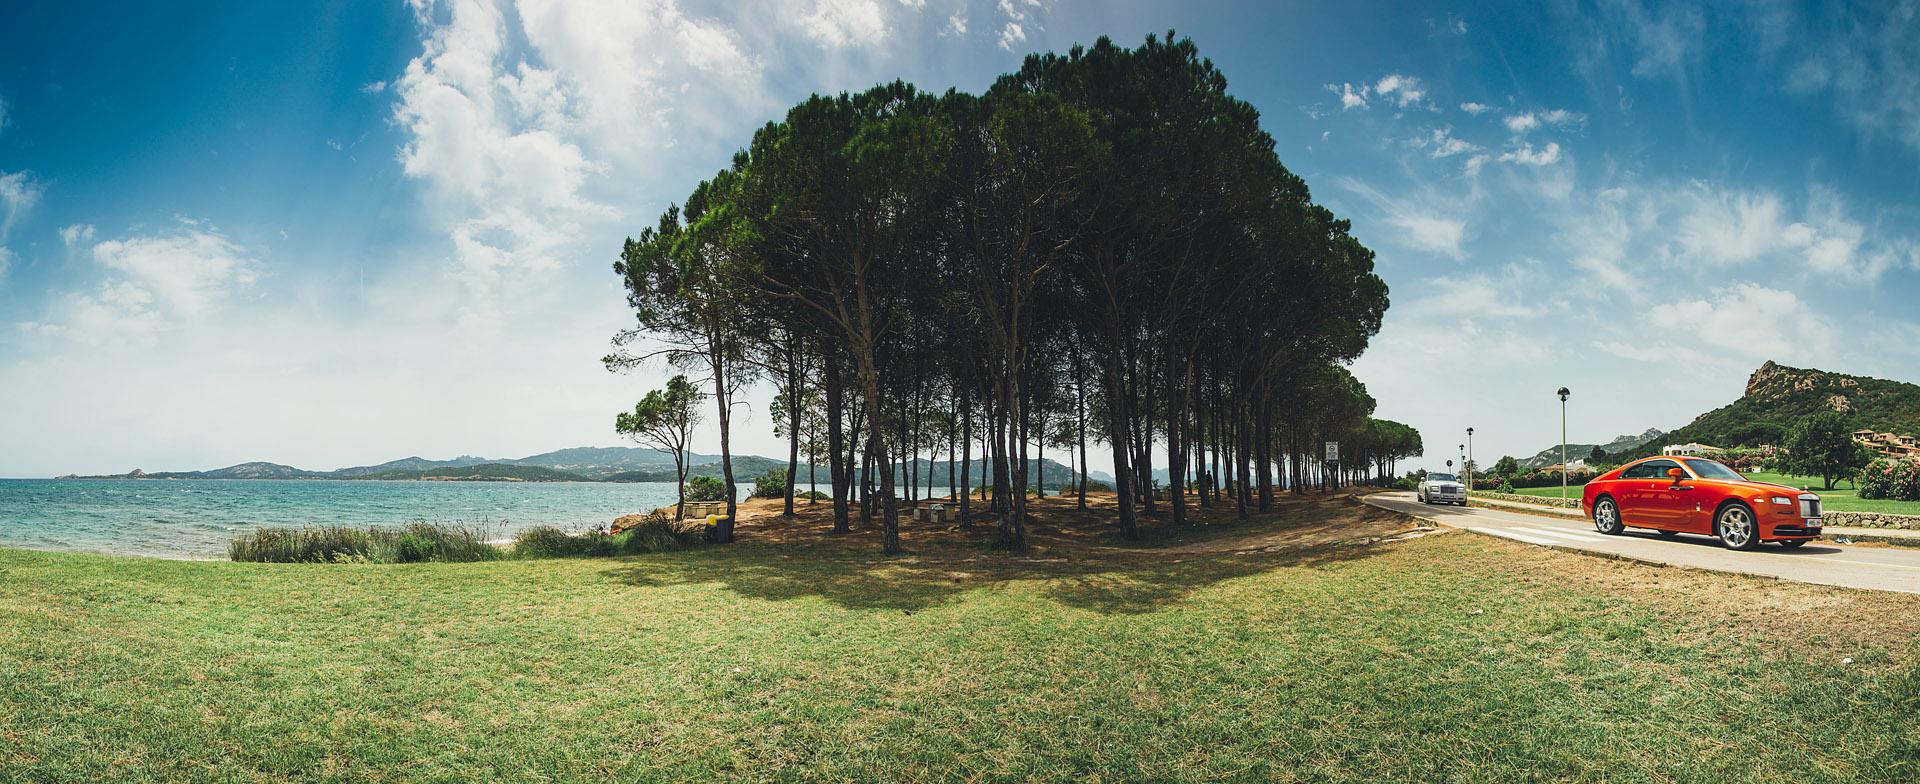 Panorama2_lowres.jpg